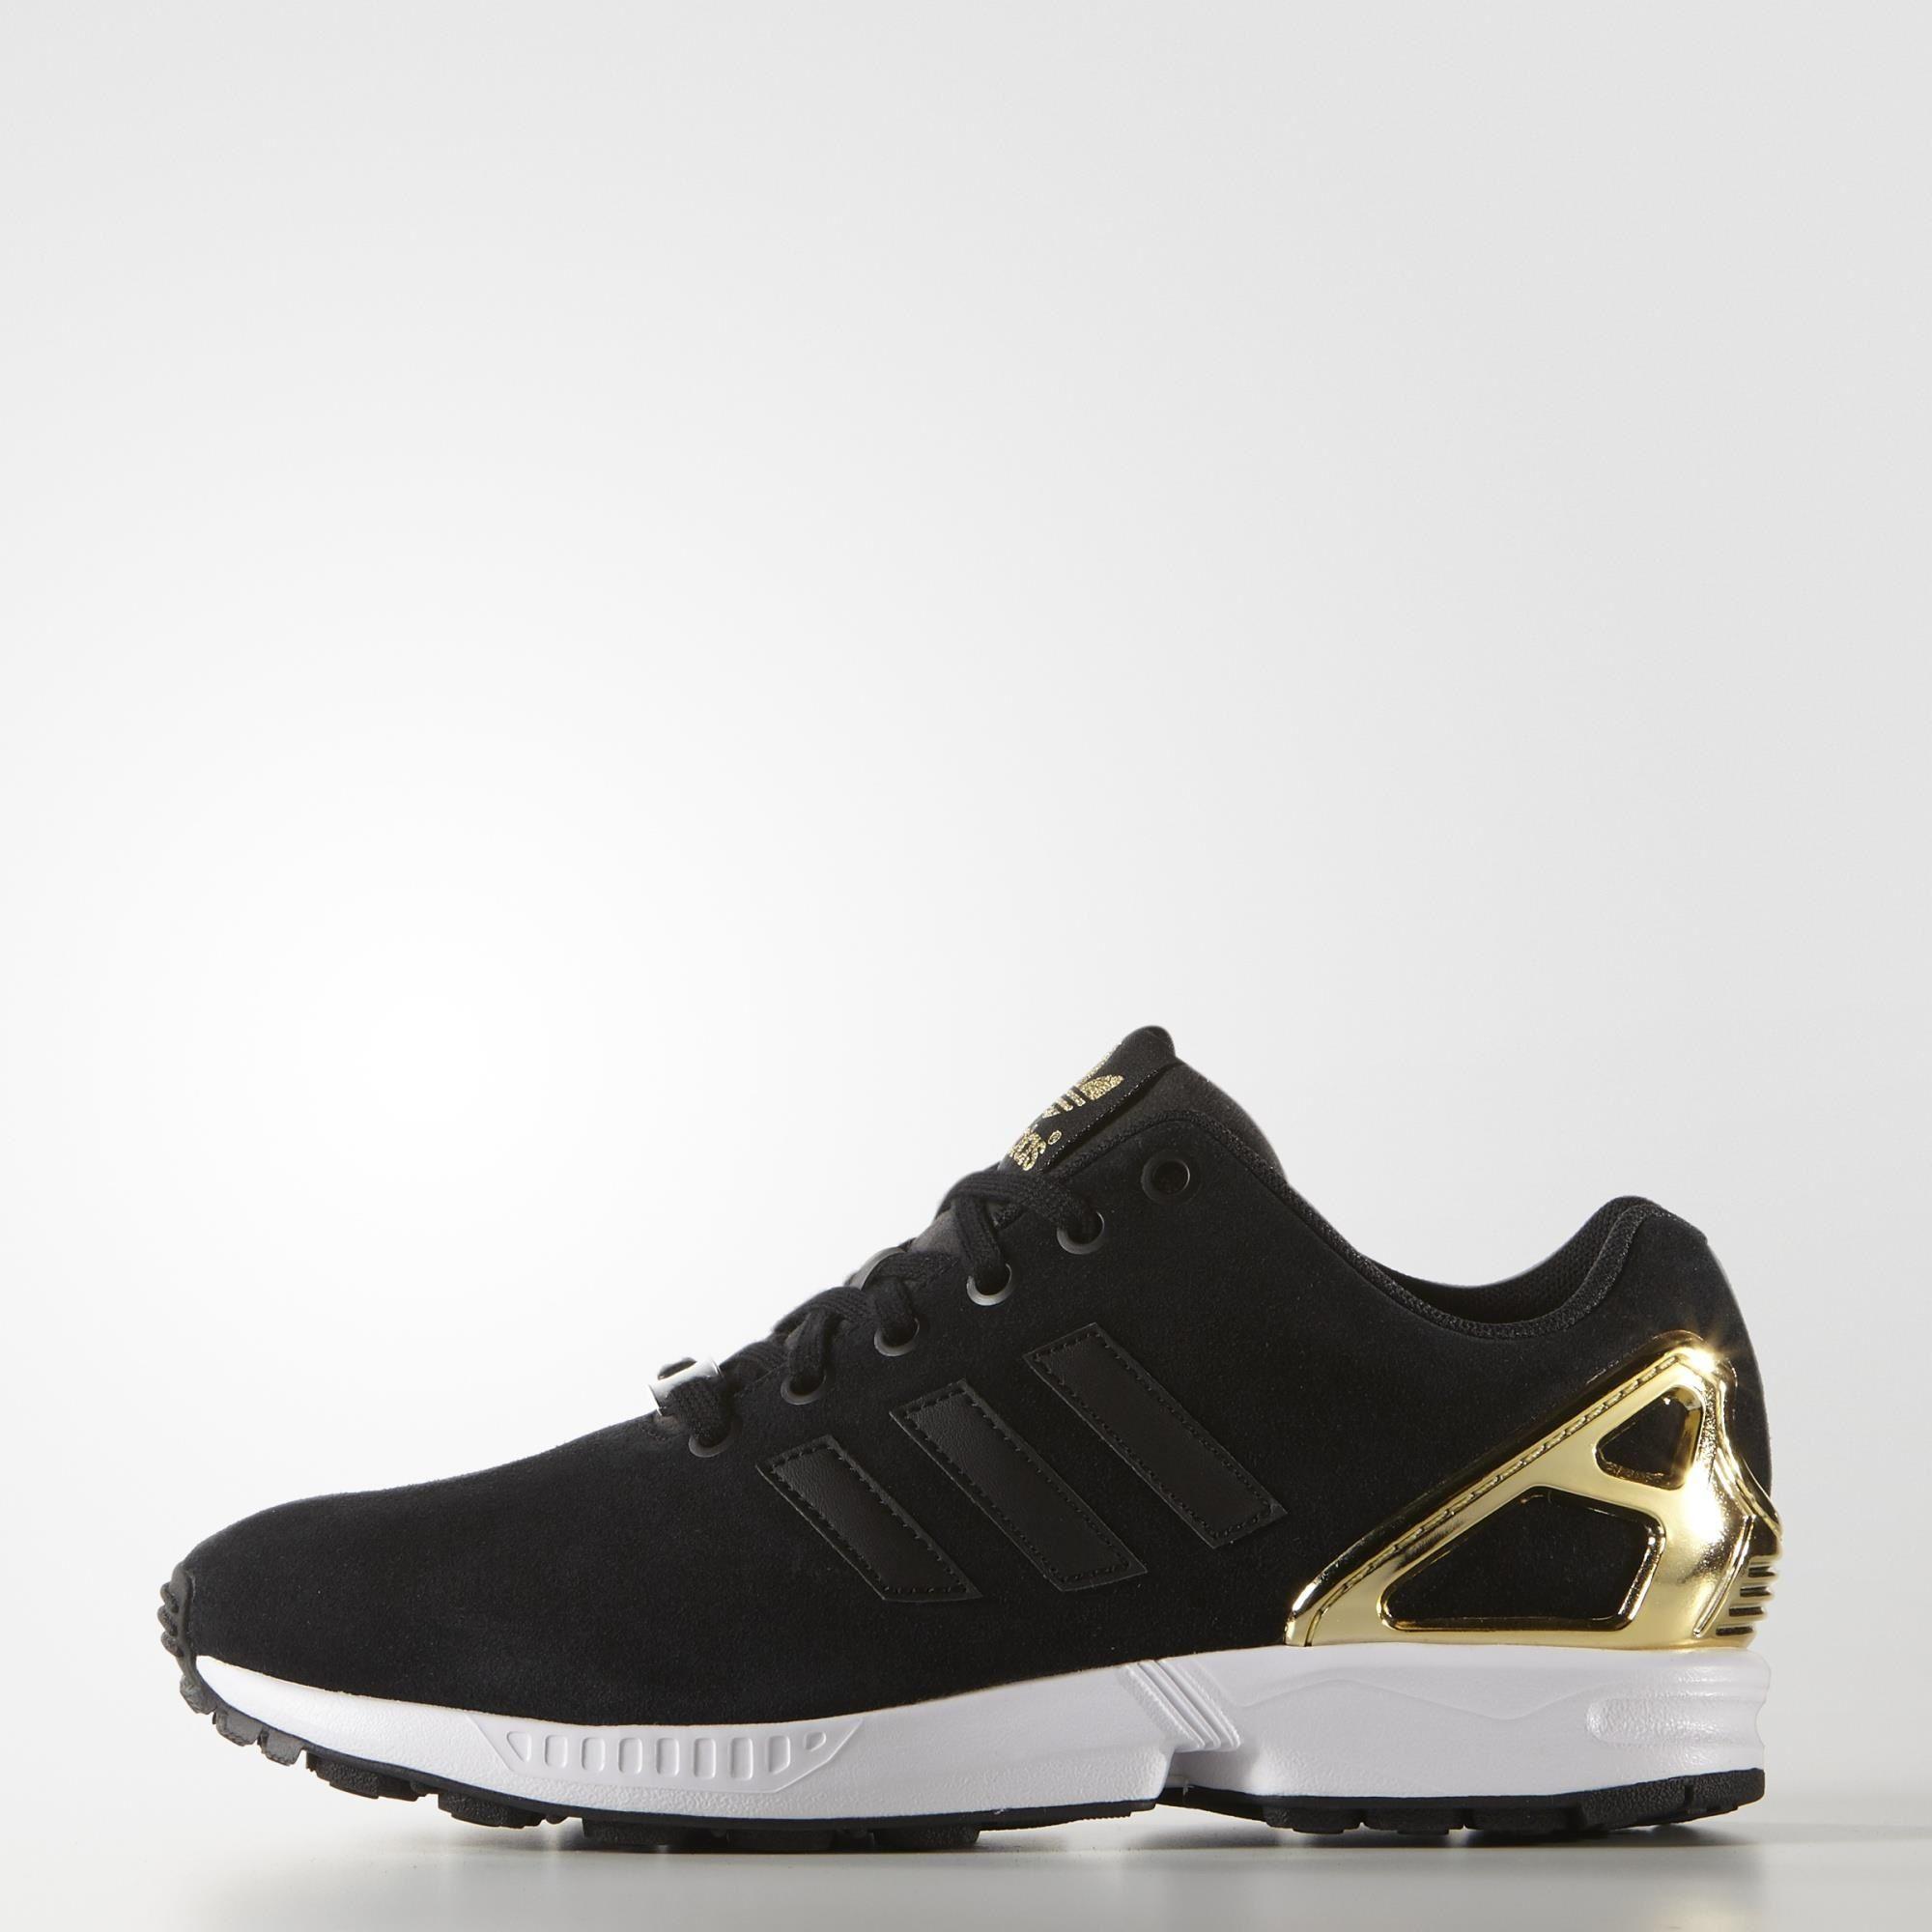 chaussure adidas pas cher, Adidas originals zx 8000 boost